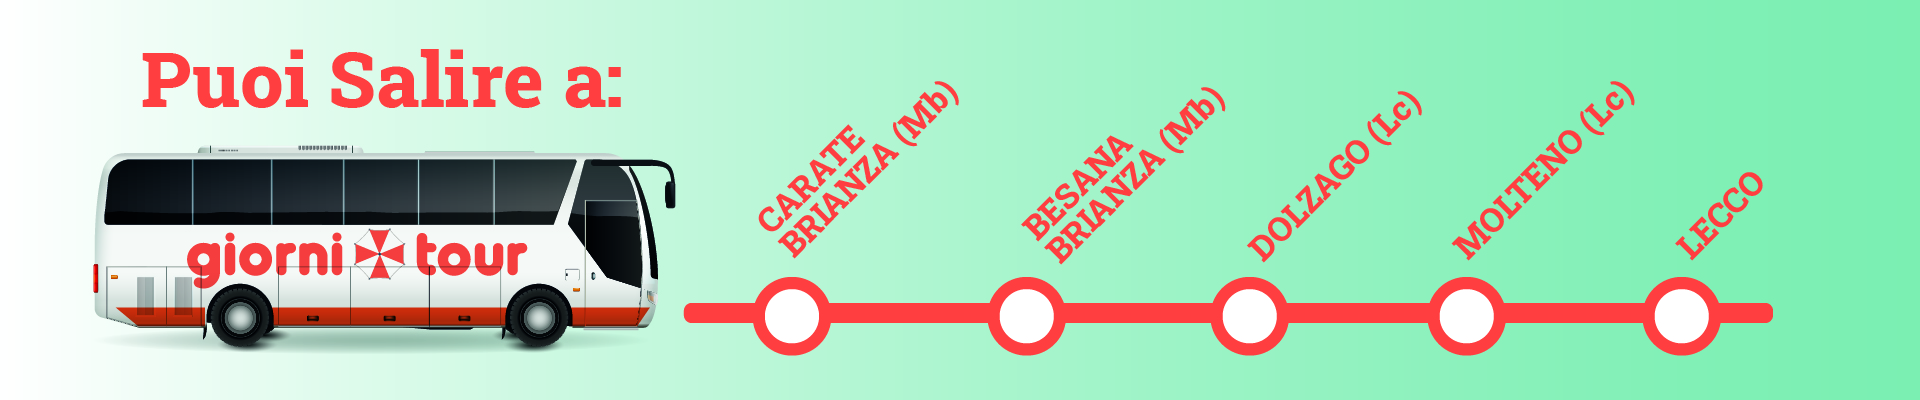 bus_giorni-v2_Tavola-disegno-1-2